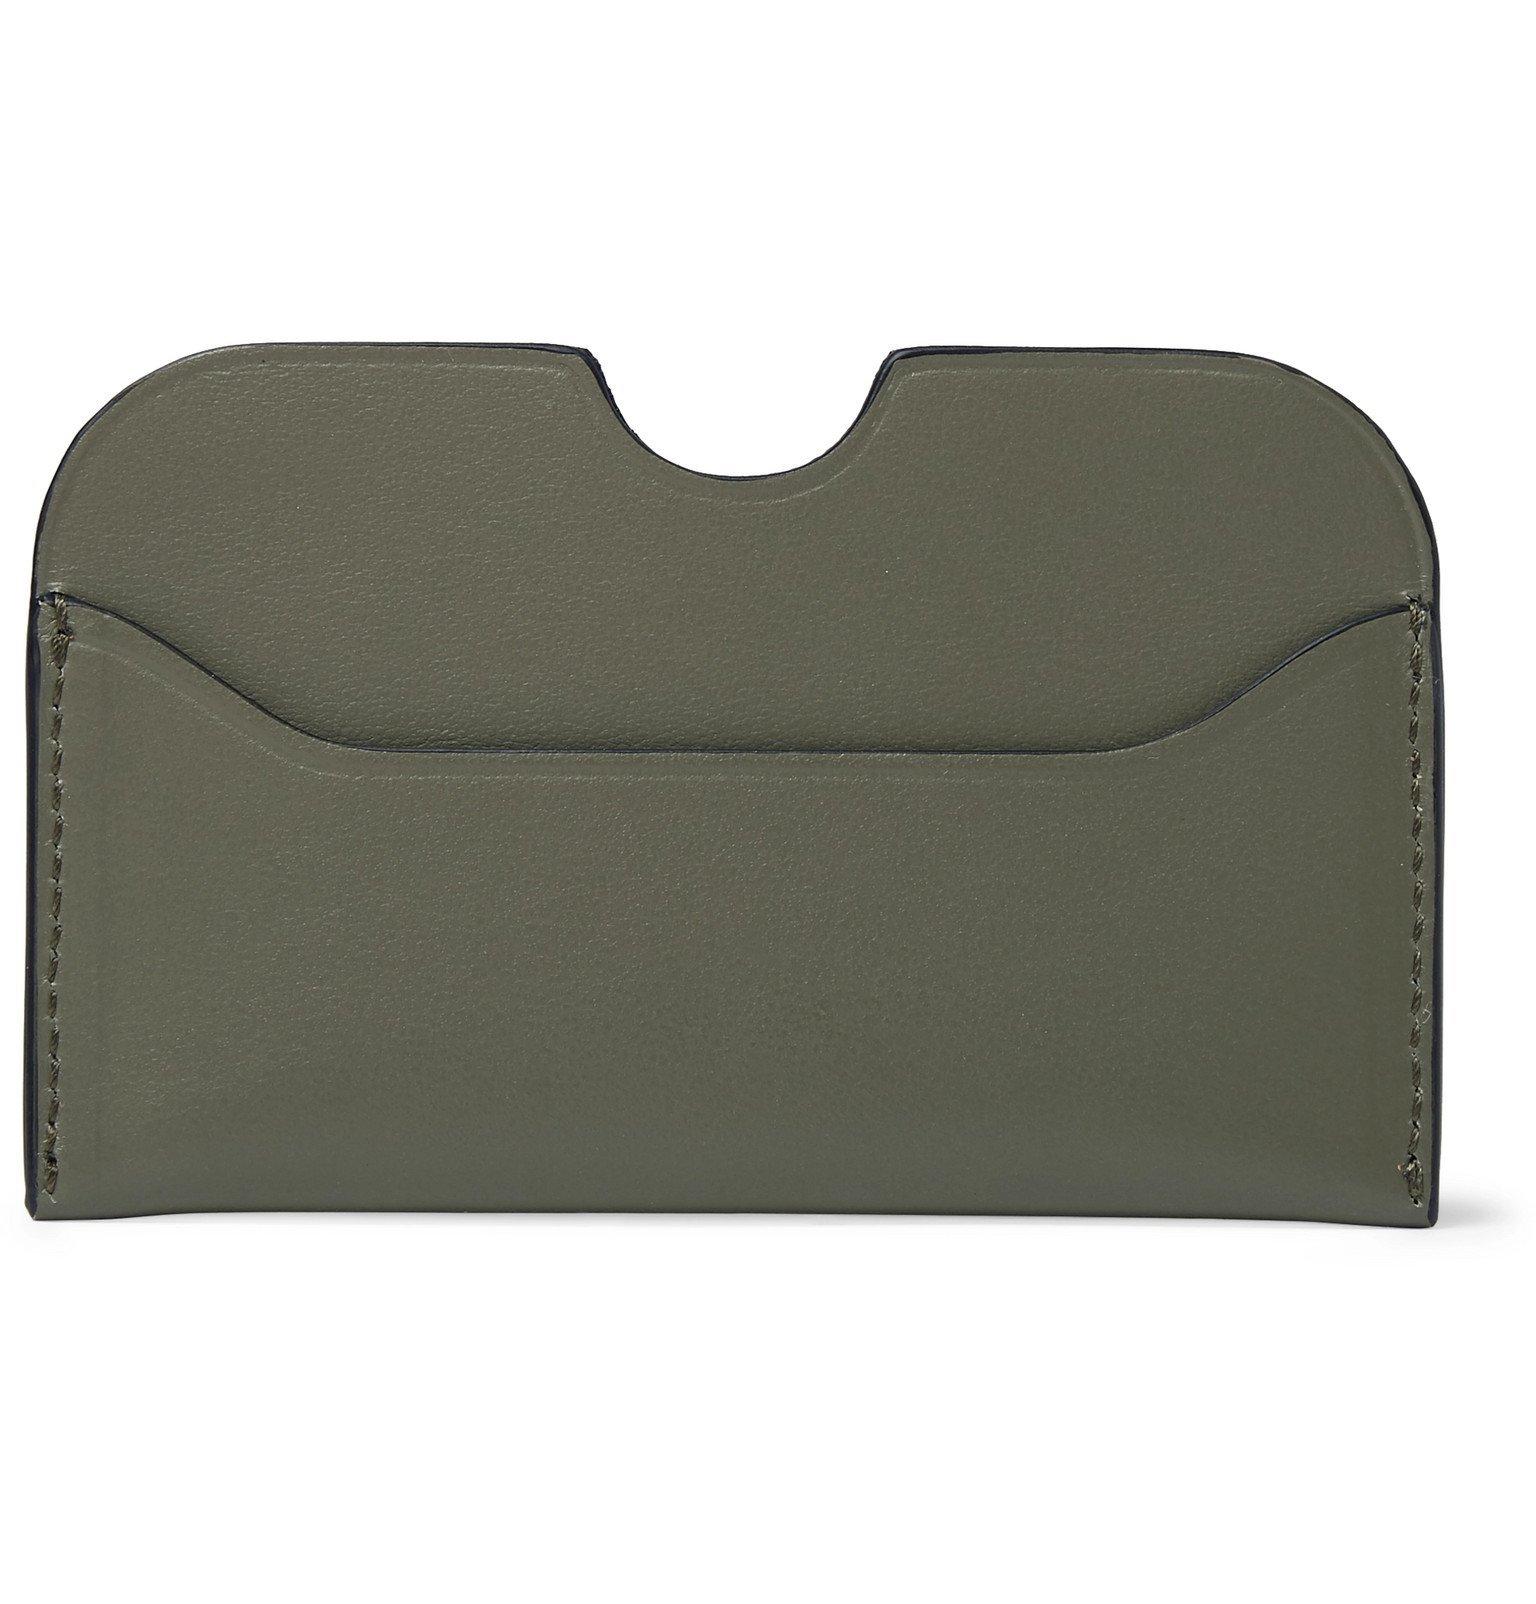 Acne Studios - Elma S Logo-Print Leather Cardholder - Green